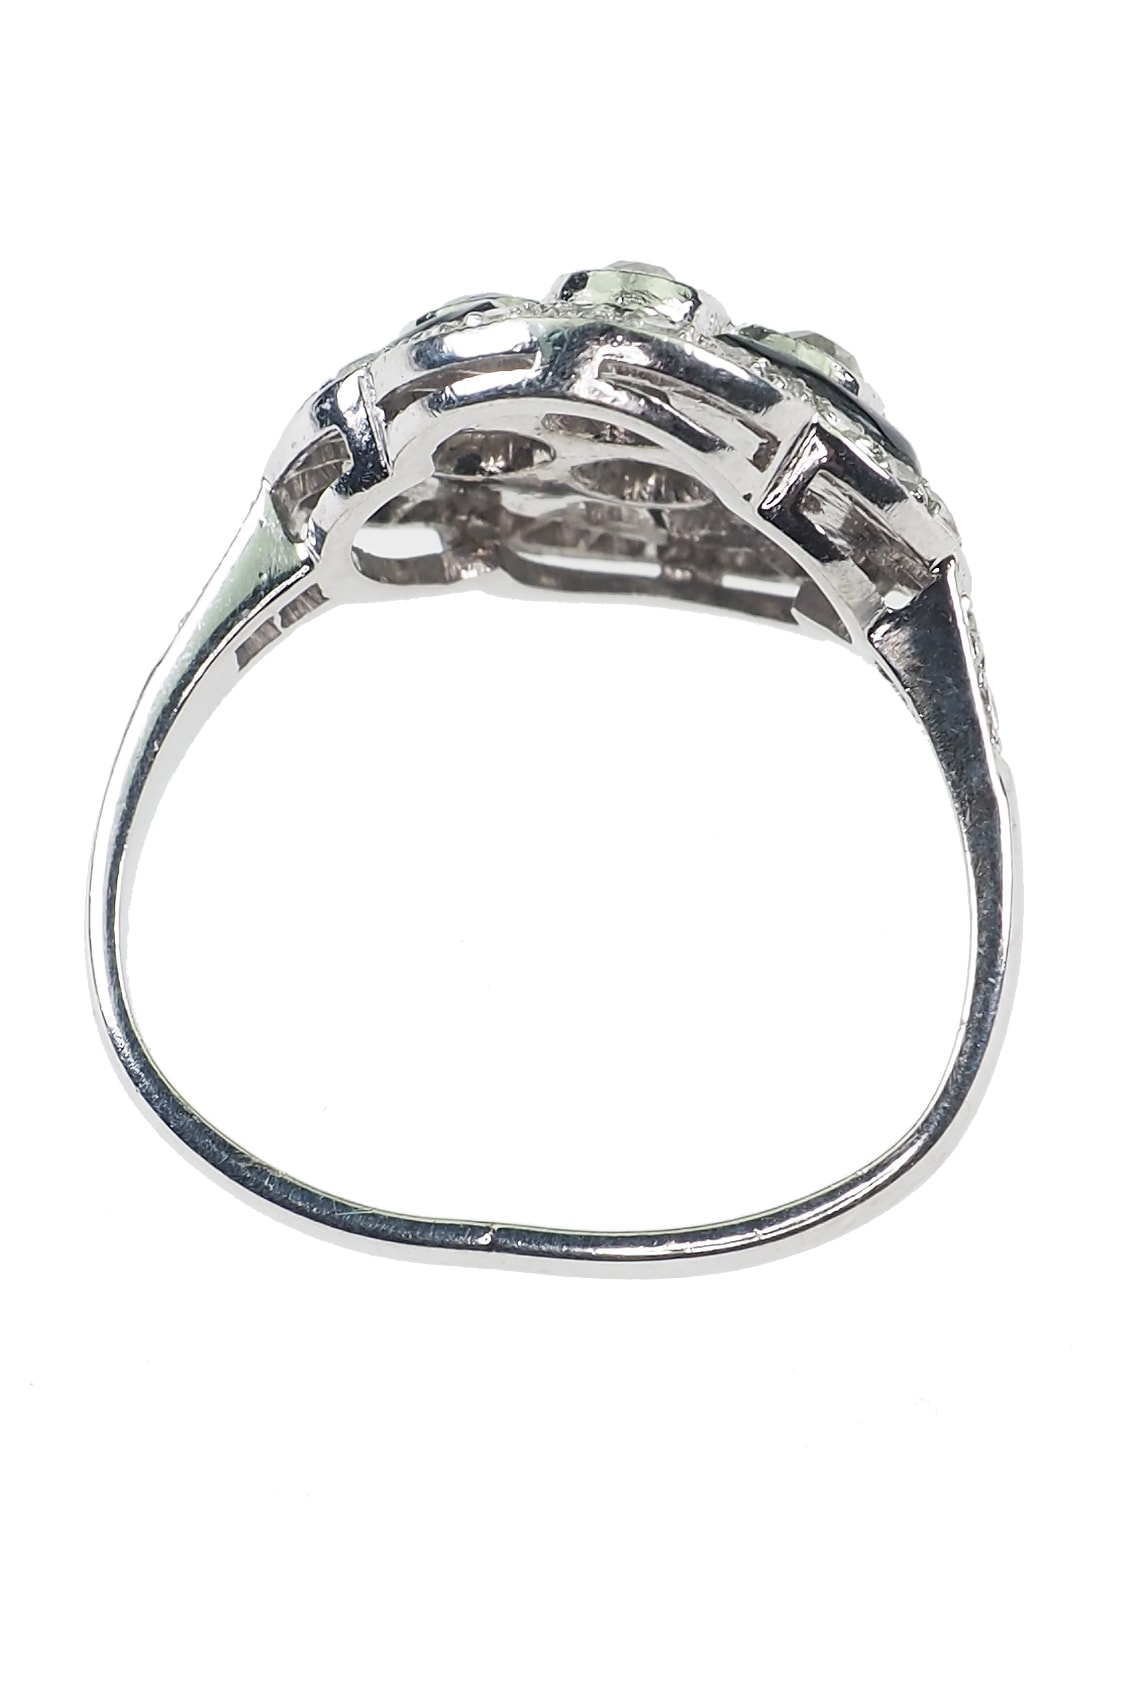 antikschmuck-ring-1344c